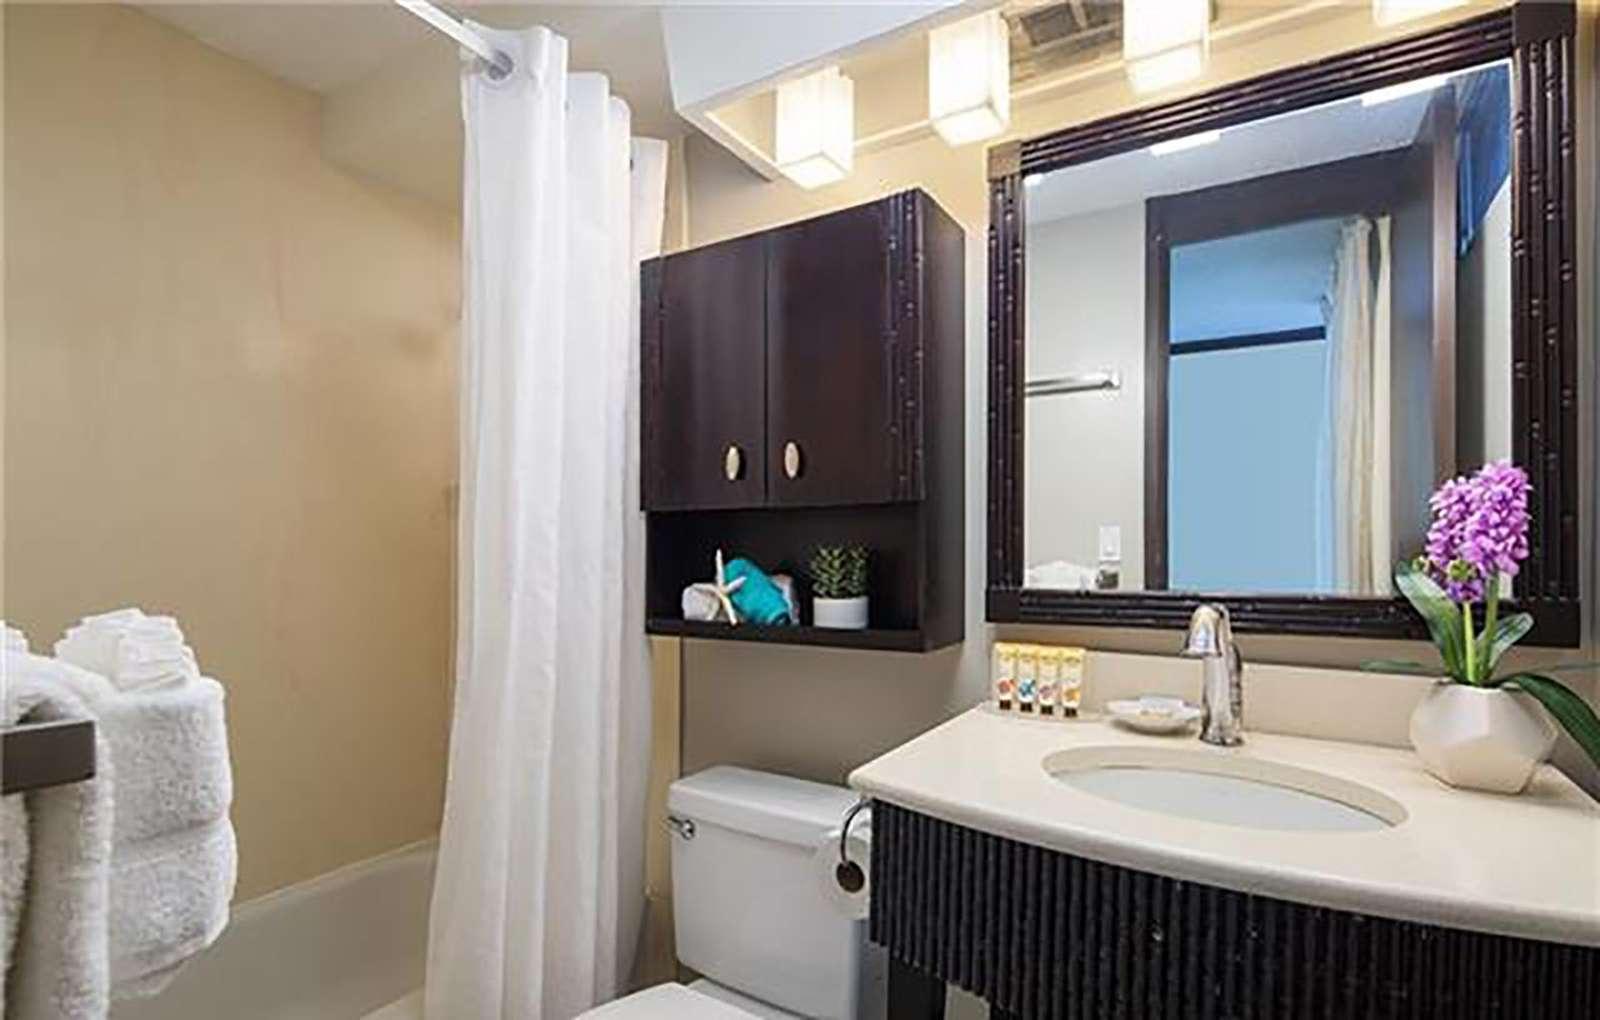 Bright and super clean bathroom